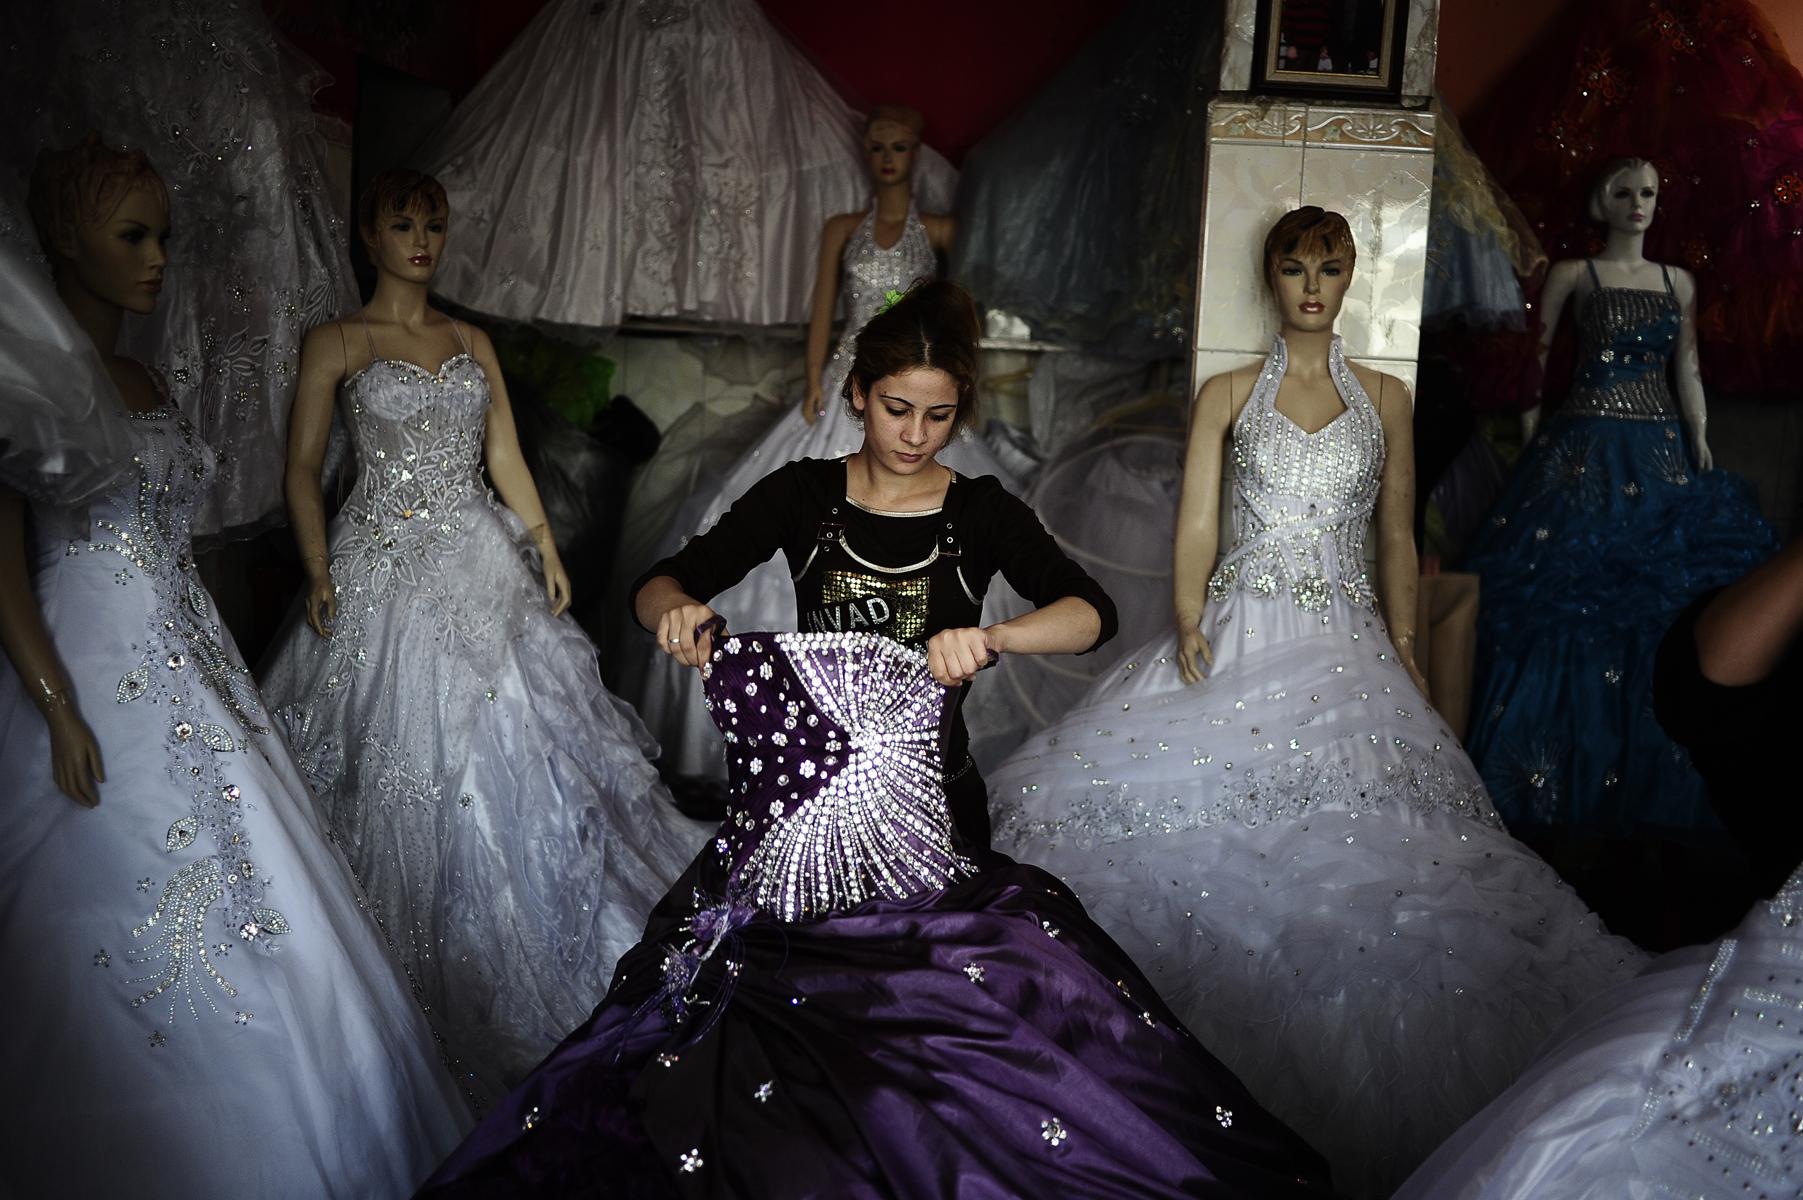 Photo: Ayman Oghanna, 2012 Emerging Photojournalist finalist.